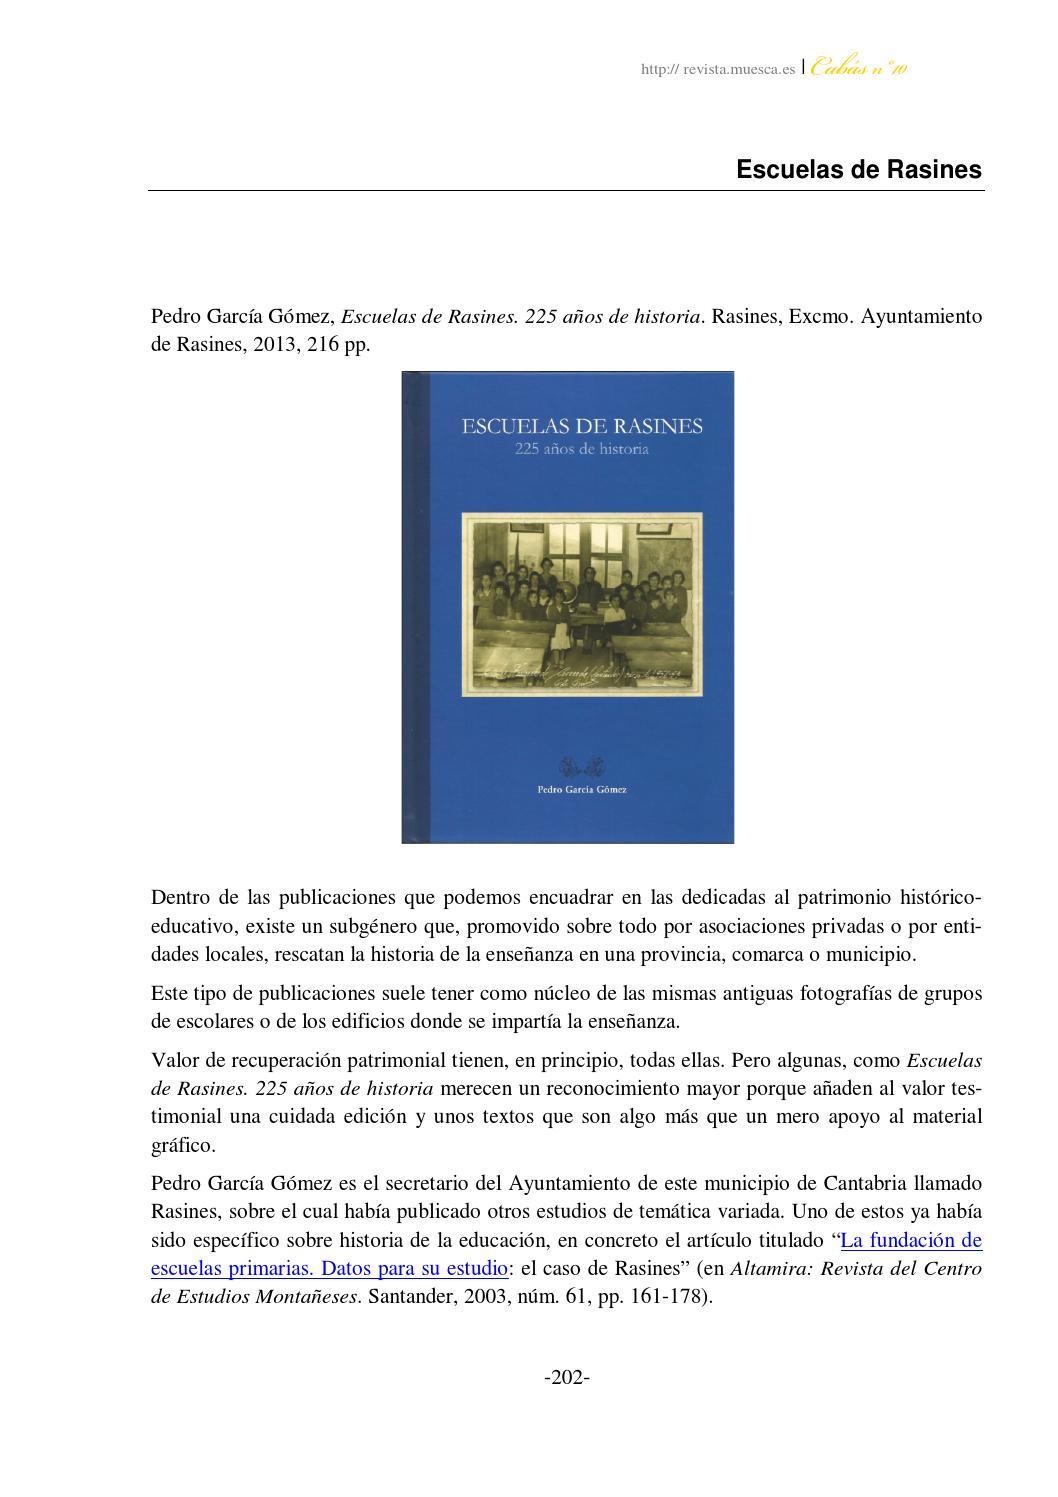 Escuelas de rasines by Jaime Bonachea Pico - issuu